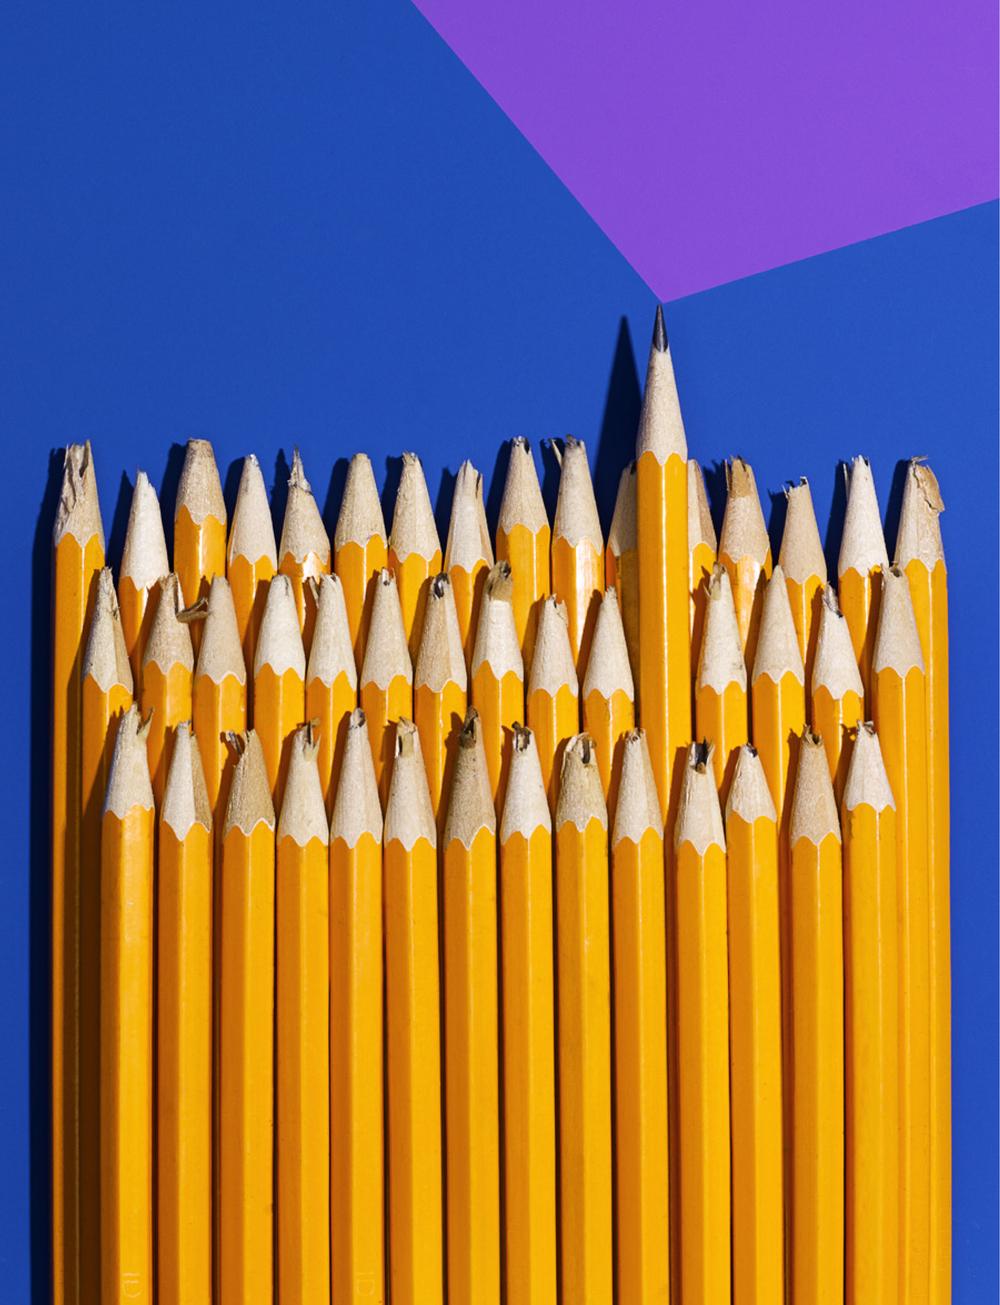 contently-pencils.jpg